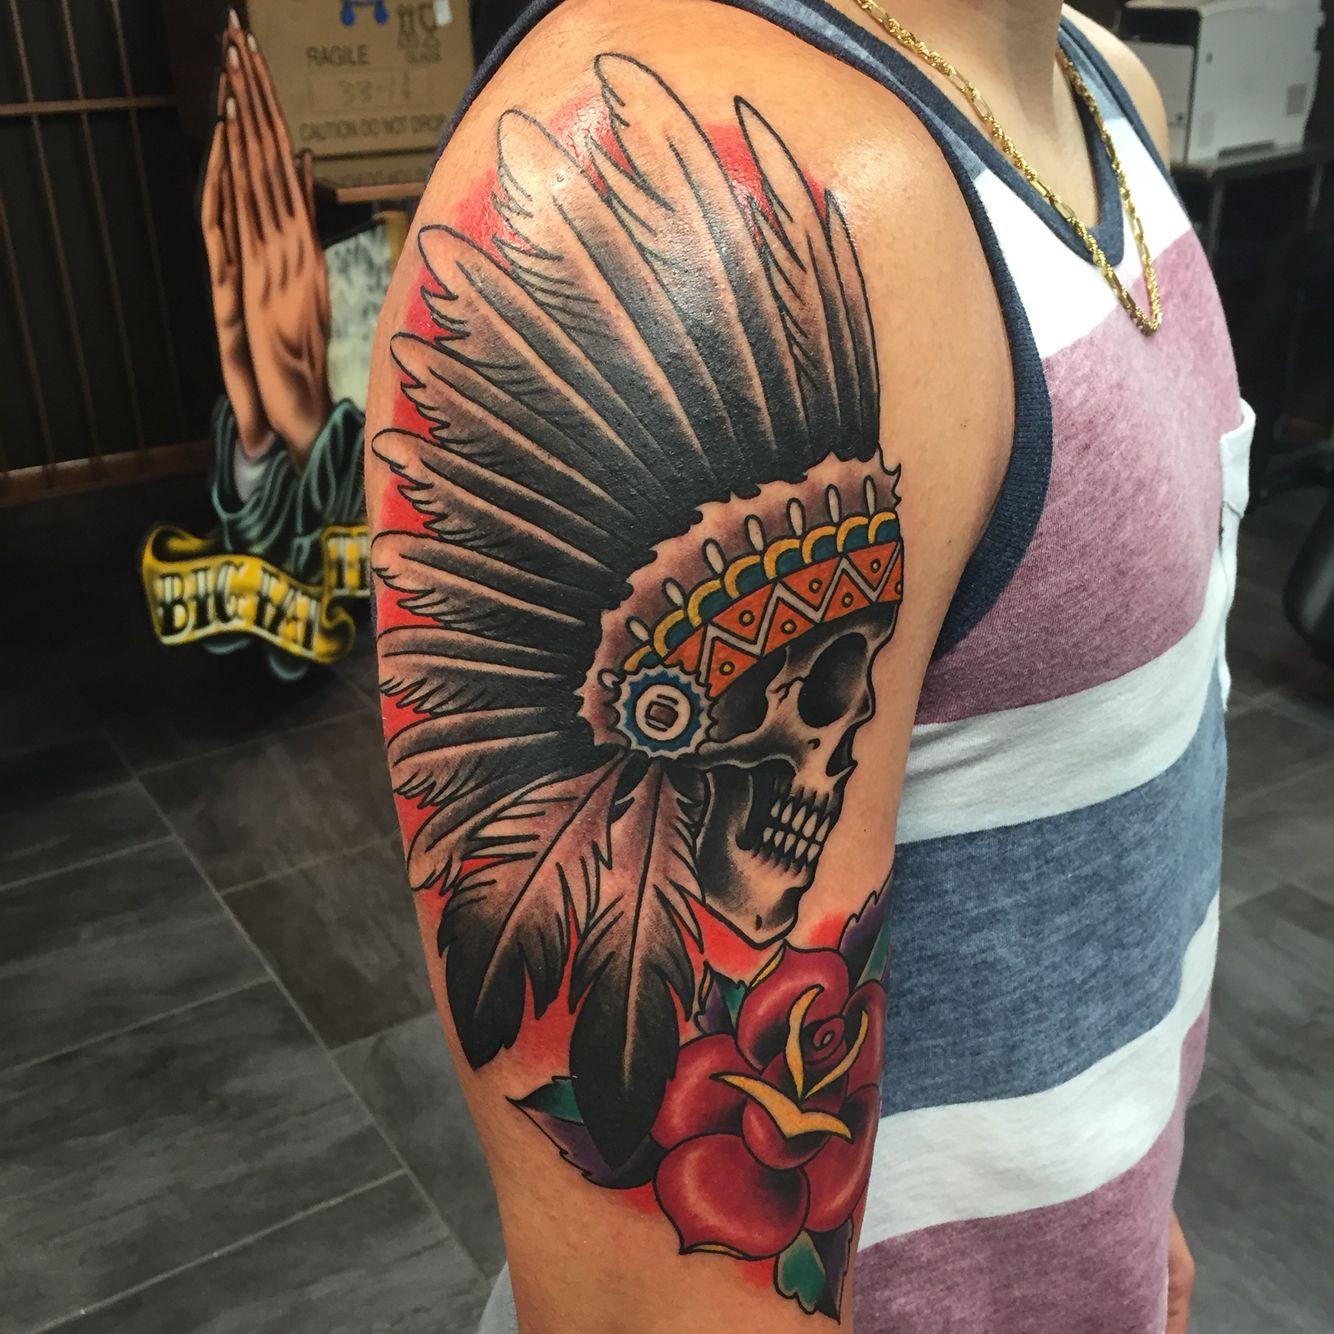 #tattoo #apache #indiantattoo #indian | Tattoos ...  #tattoo #apache...